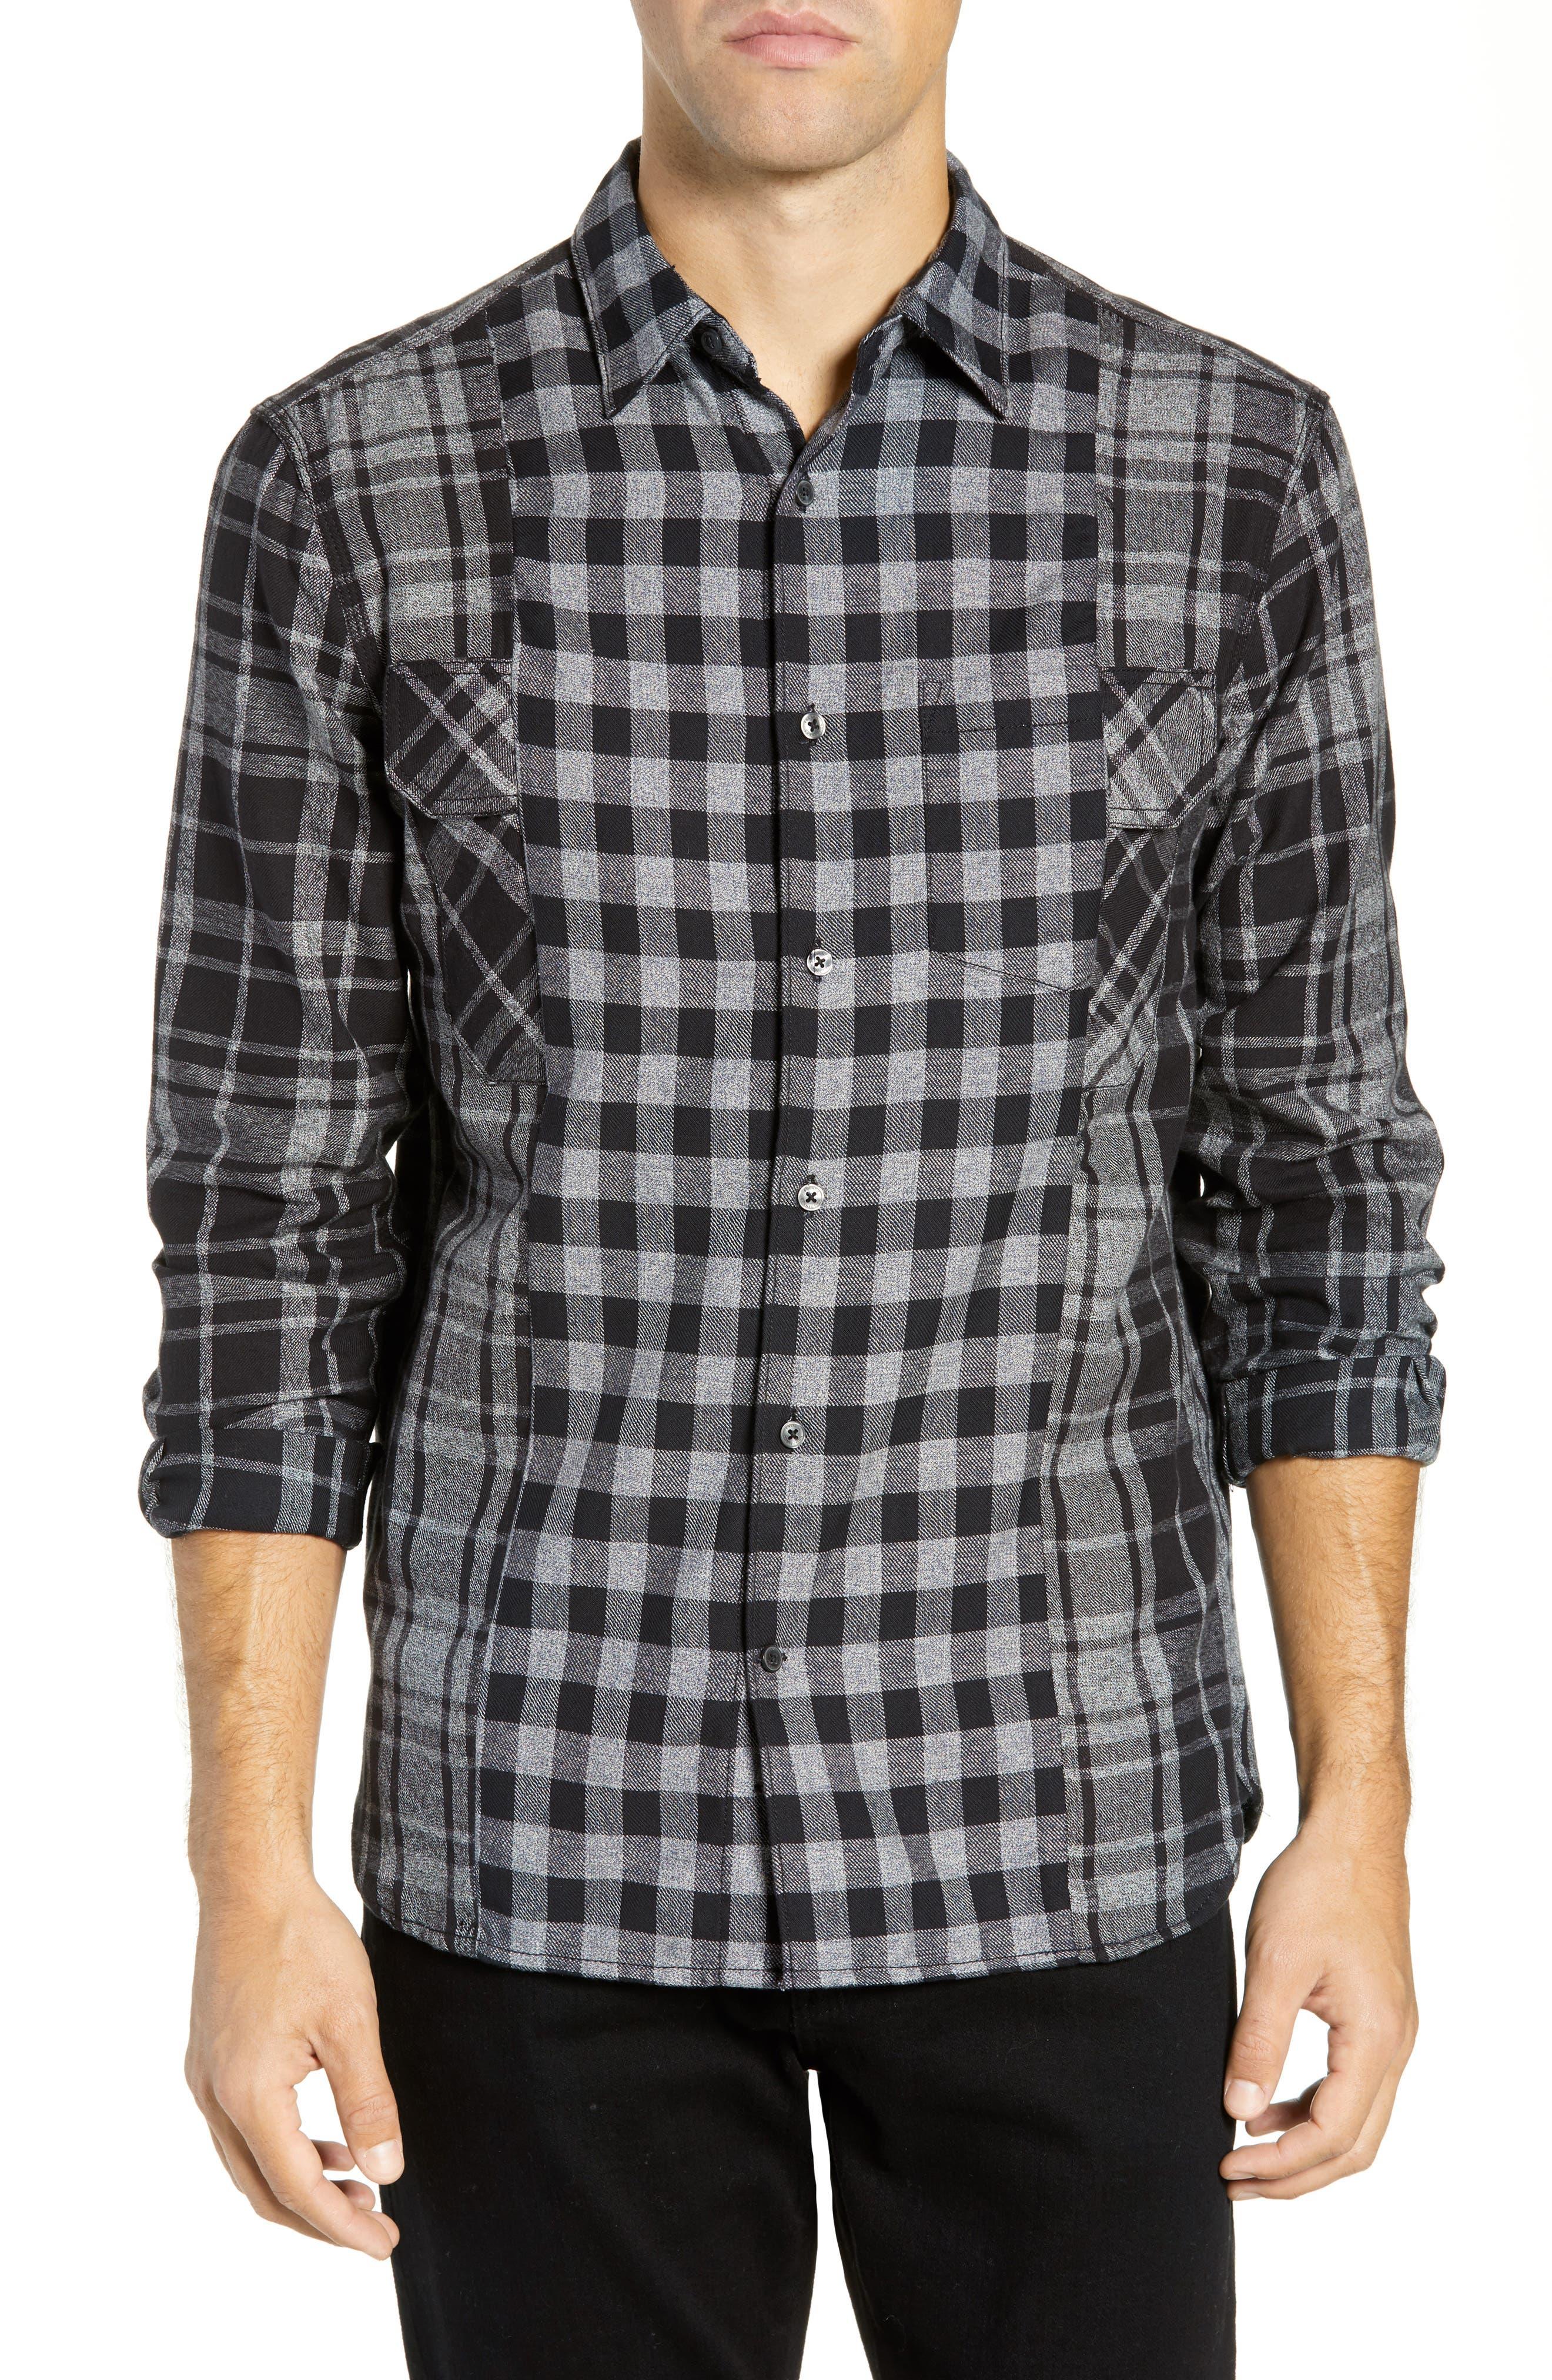 Bits & Pieces Loose Fit Sport Shirt,                             Main thumbnail 1, color,                             BLACK CHECKS